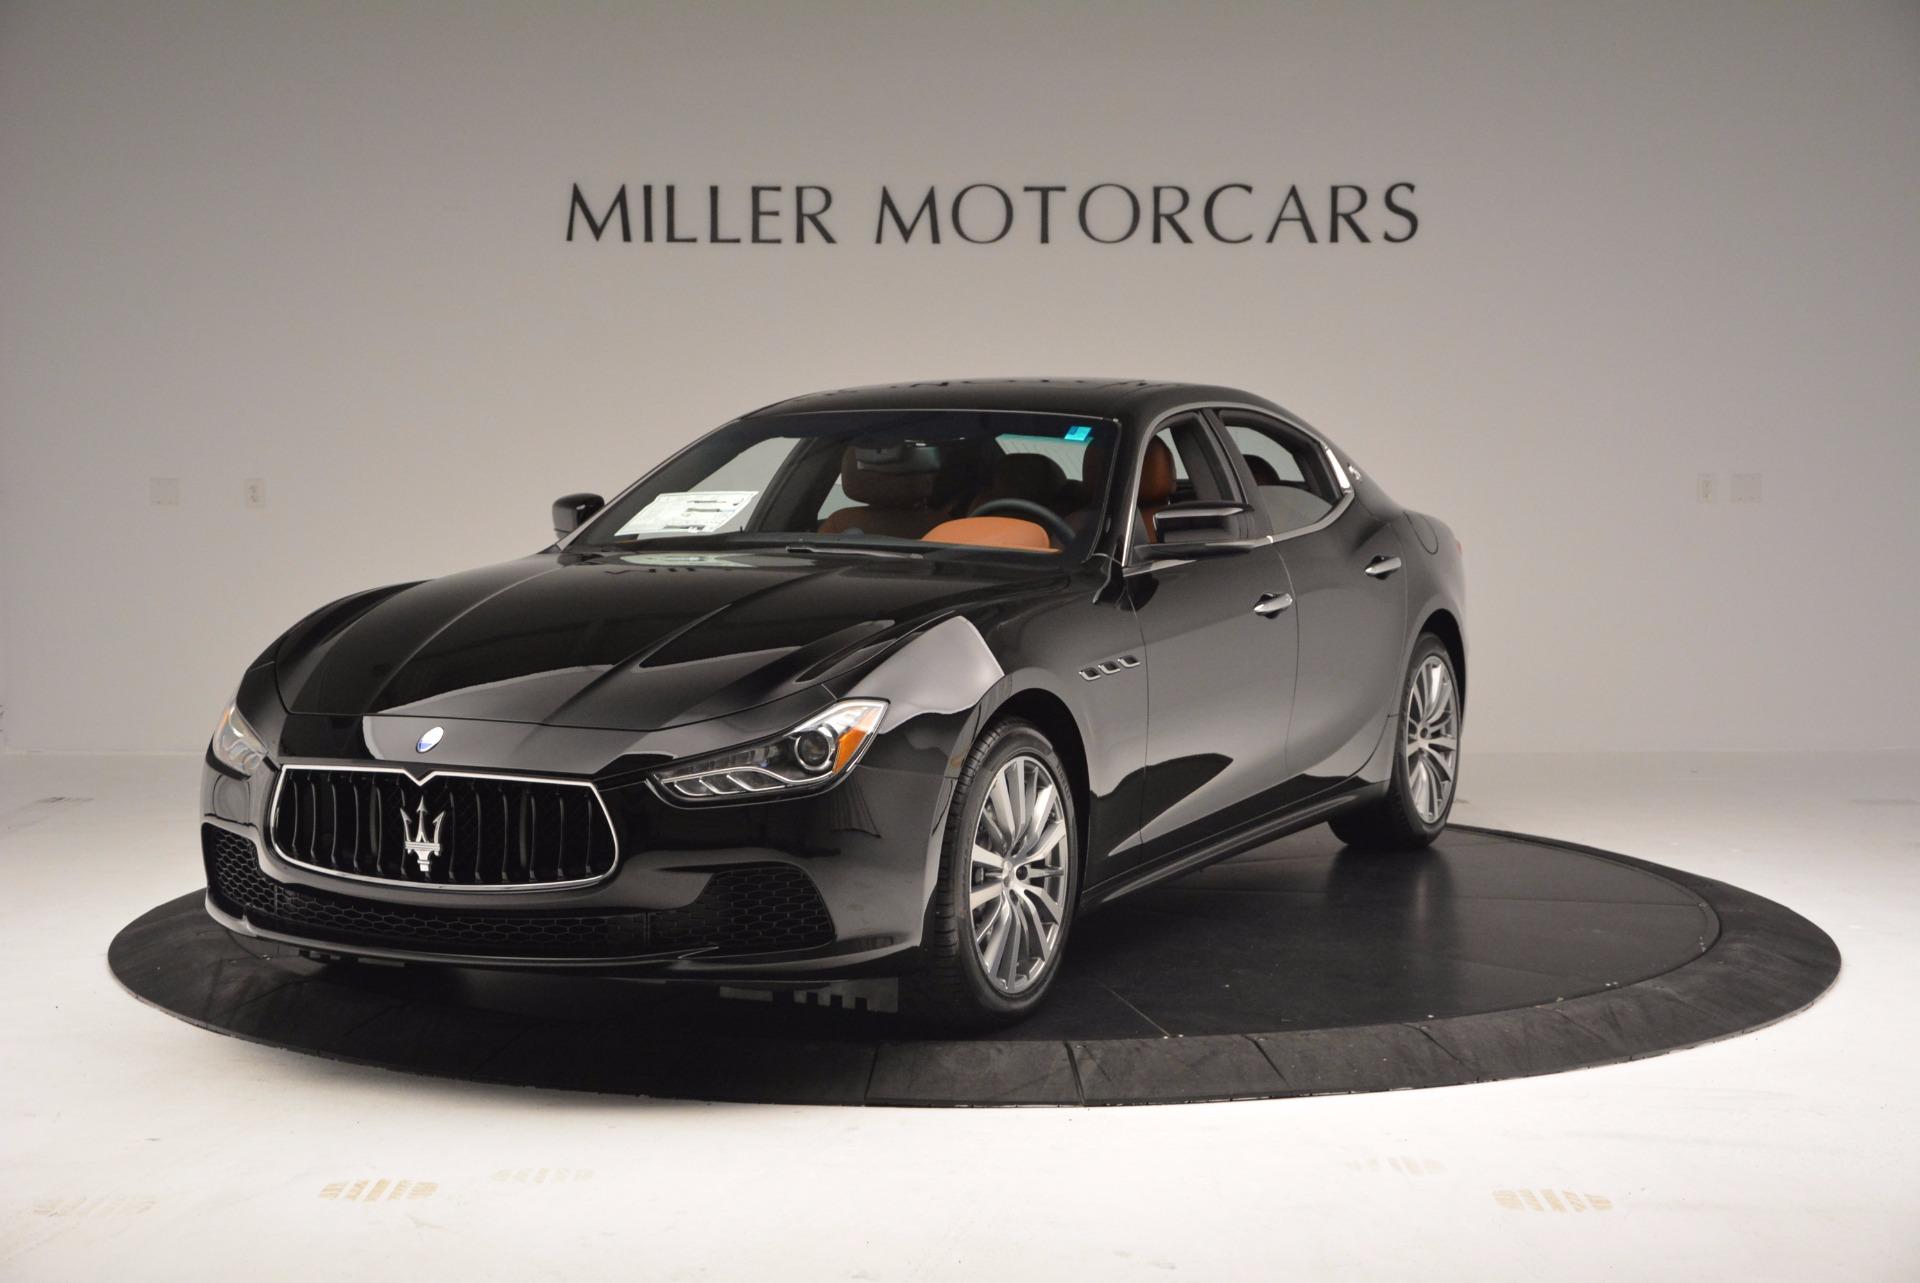 New 2017 Maserati Ghibli SQ4 for sale Sold at McLaren Greenwich in Greenwich CT 06830 1